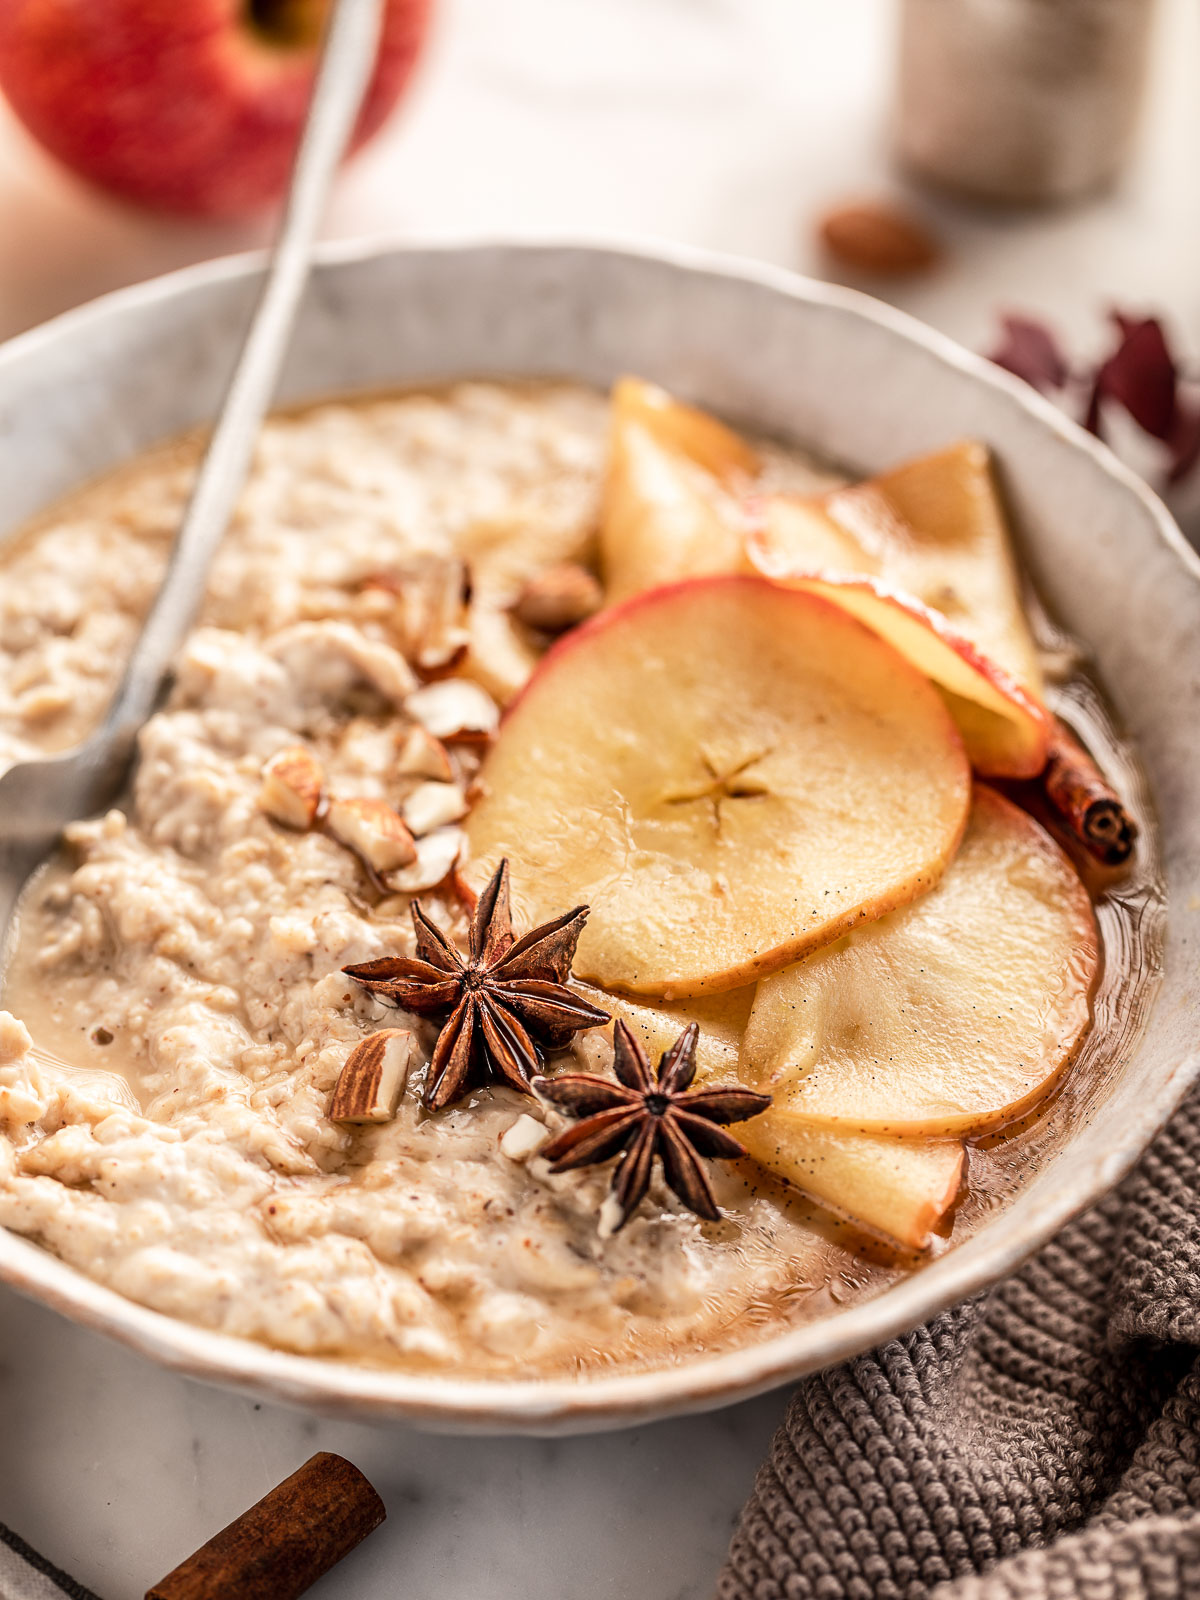 ricetta porridge alle mele e cannella cremoso porridge torta di mele vegan healthy creamy apple pie oatmeal recipe senza glutine gluten-free